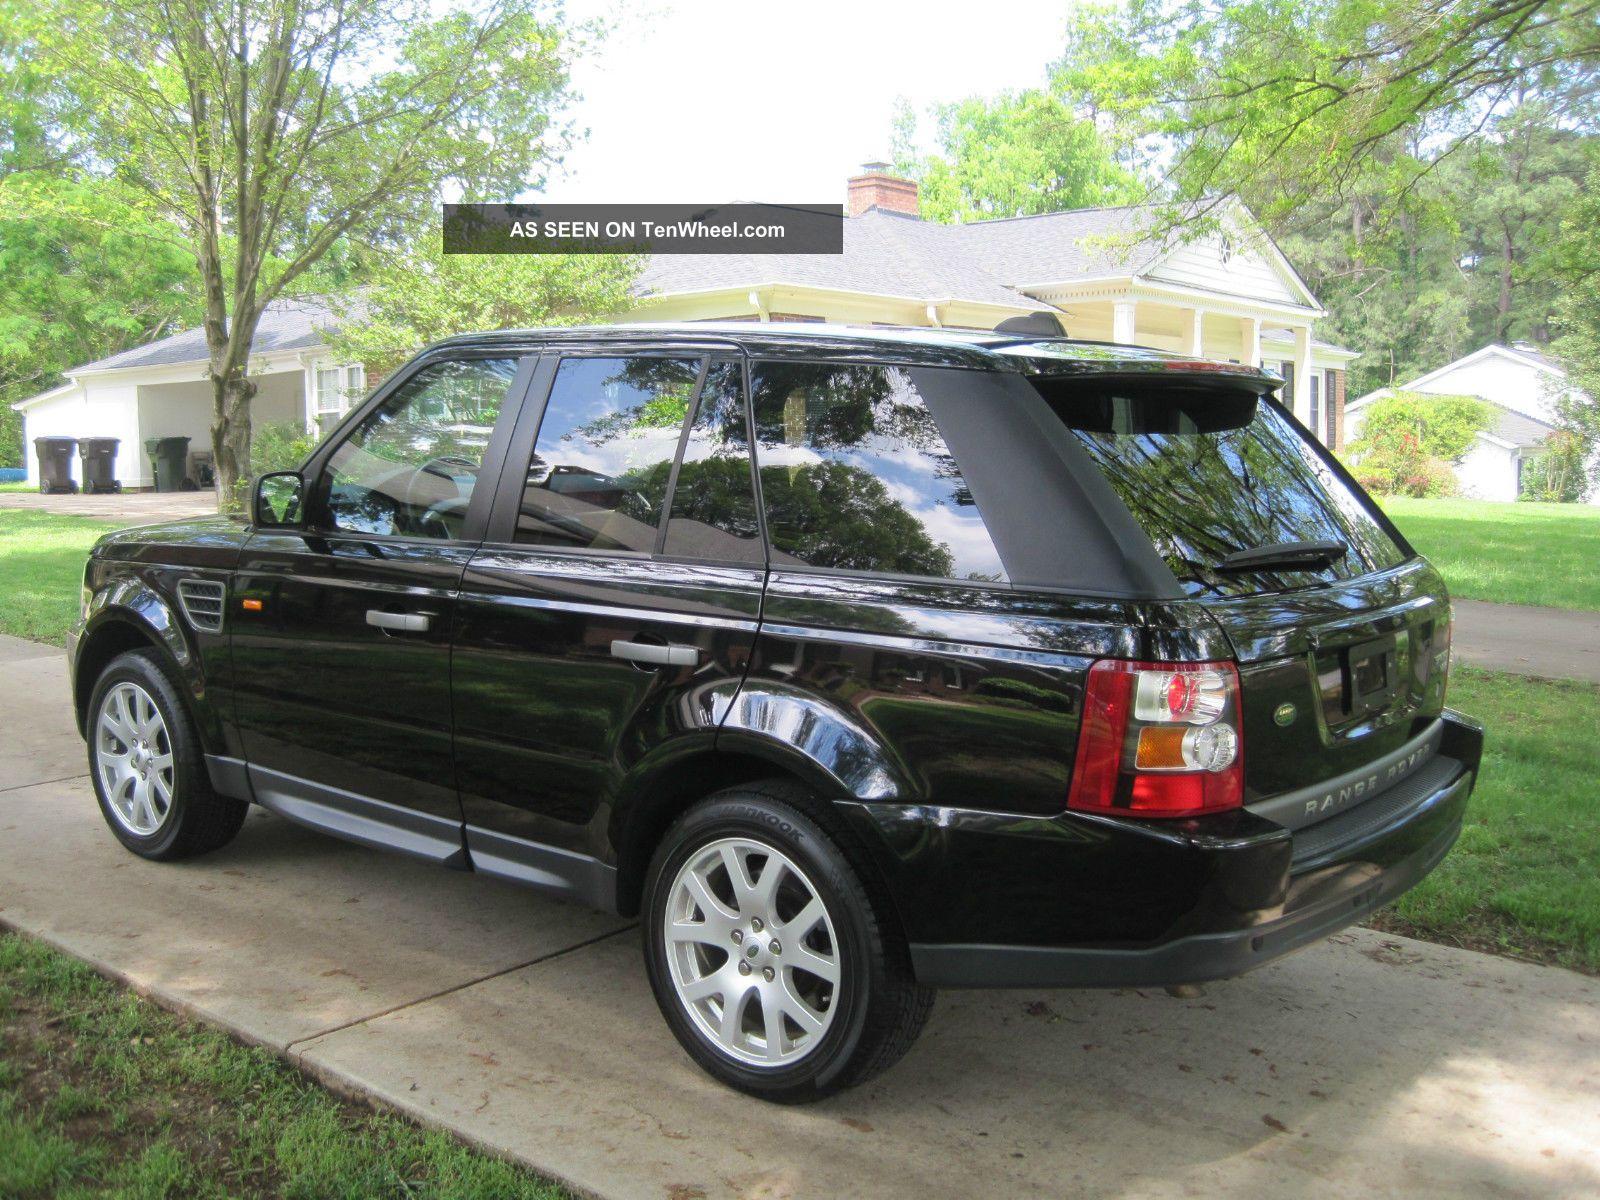 2008 land rover range rover sport hse luxury w dvd in headrest cooler in arm. Black Bedroom Furniture Sets. Home Design Ideas